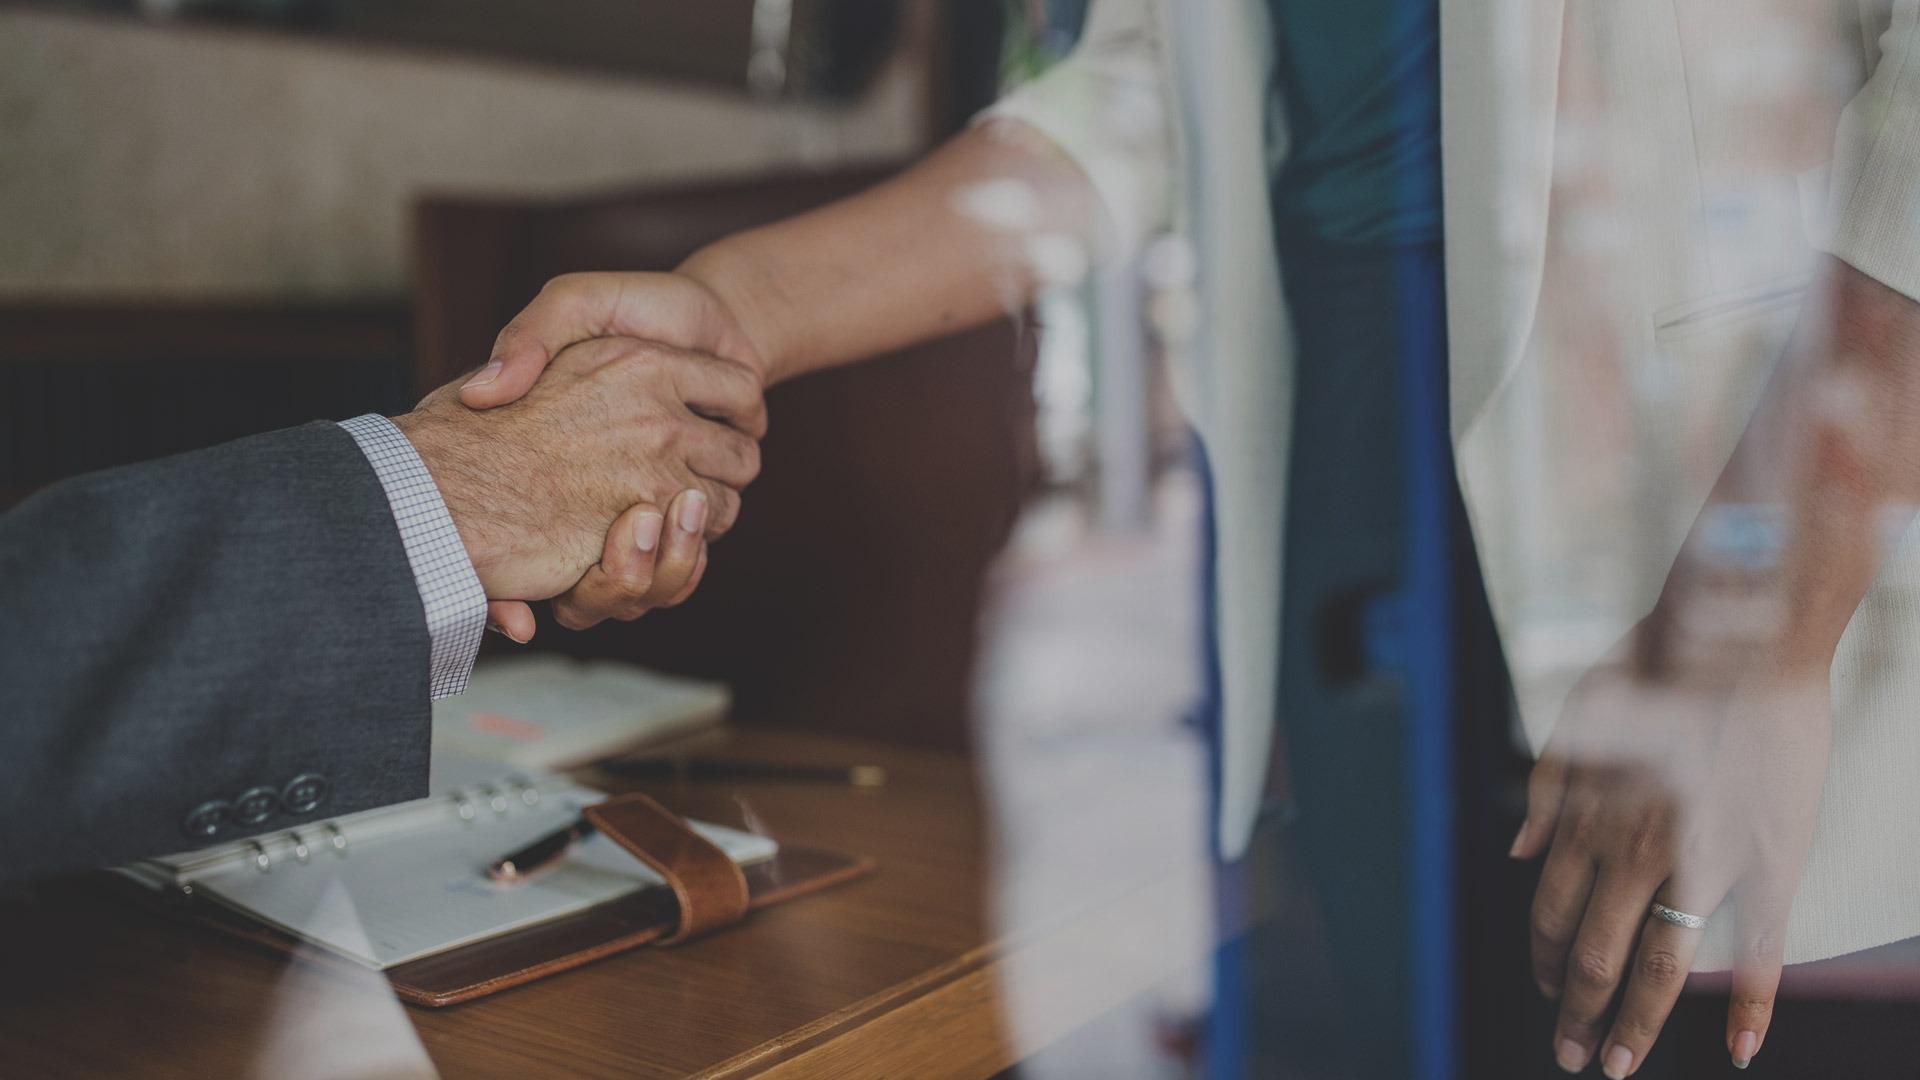 Stretta di mano tra due persone in affari